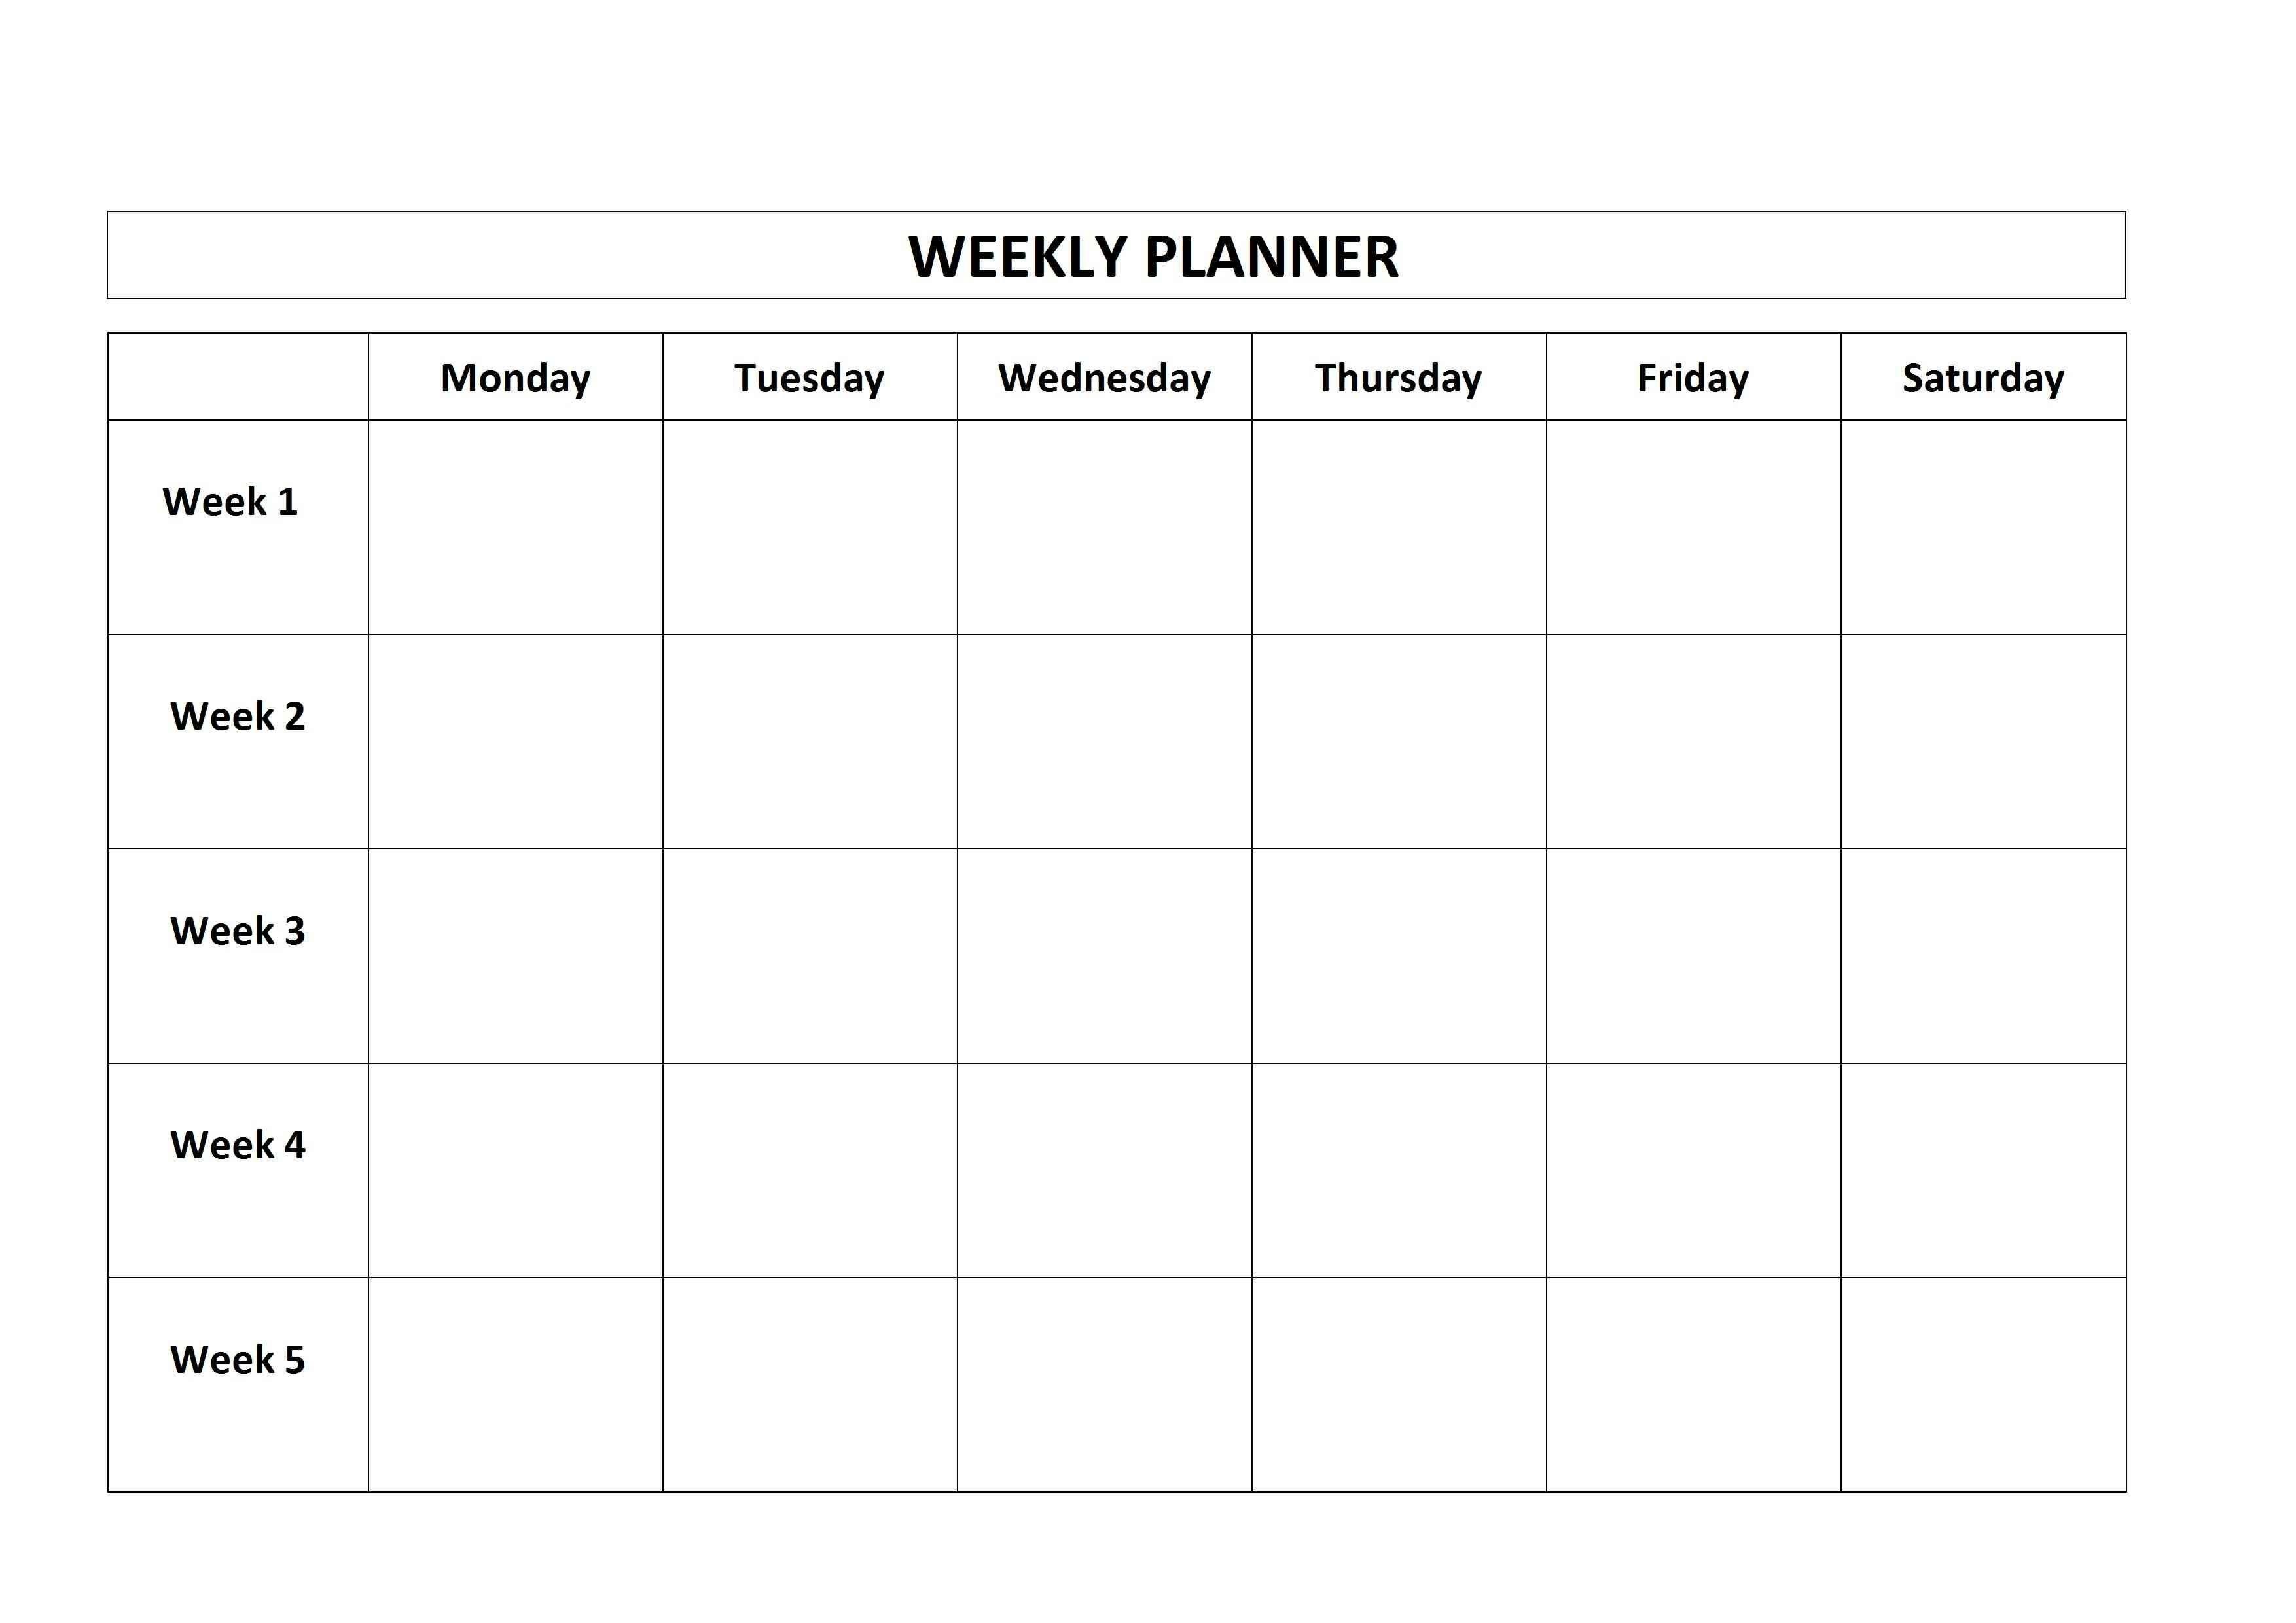 Free Printable Weekly Planner Monday Friday School Calendar Calendar Saturday To Friday